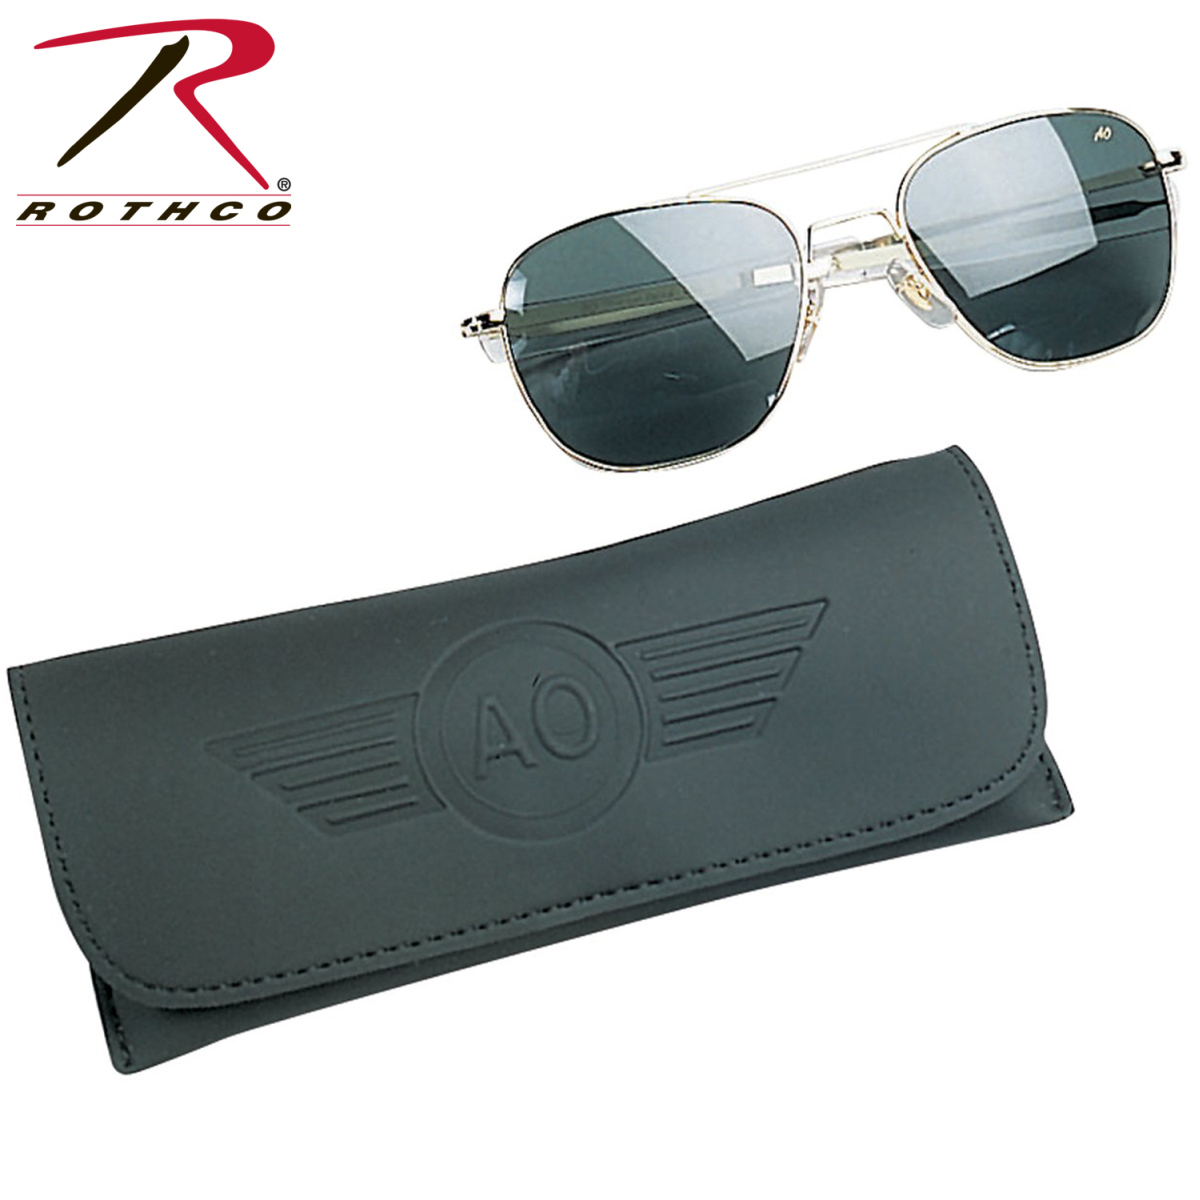 cc18c04645 Buy AO Eyewear 55MM Polarized Pilot Sunglasses - Rothco Online at ...